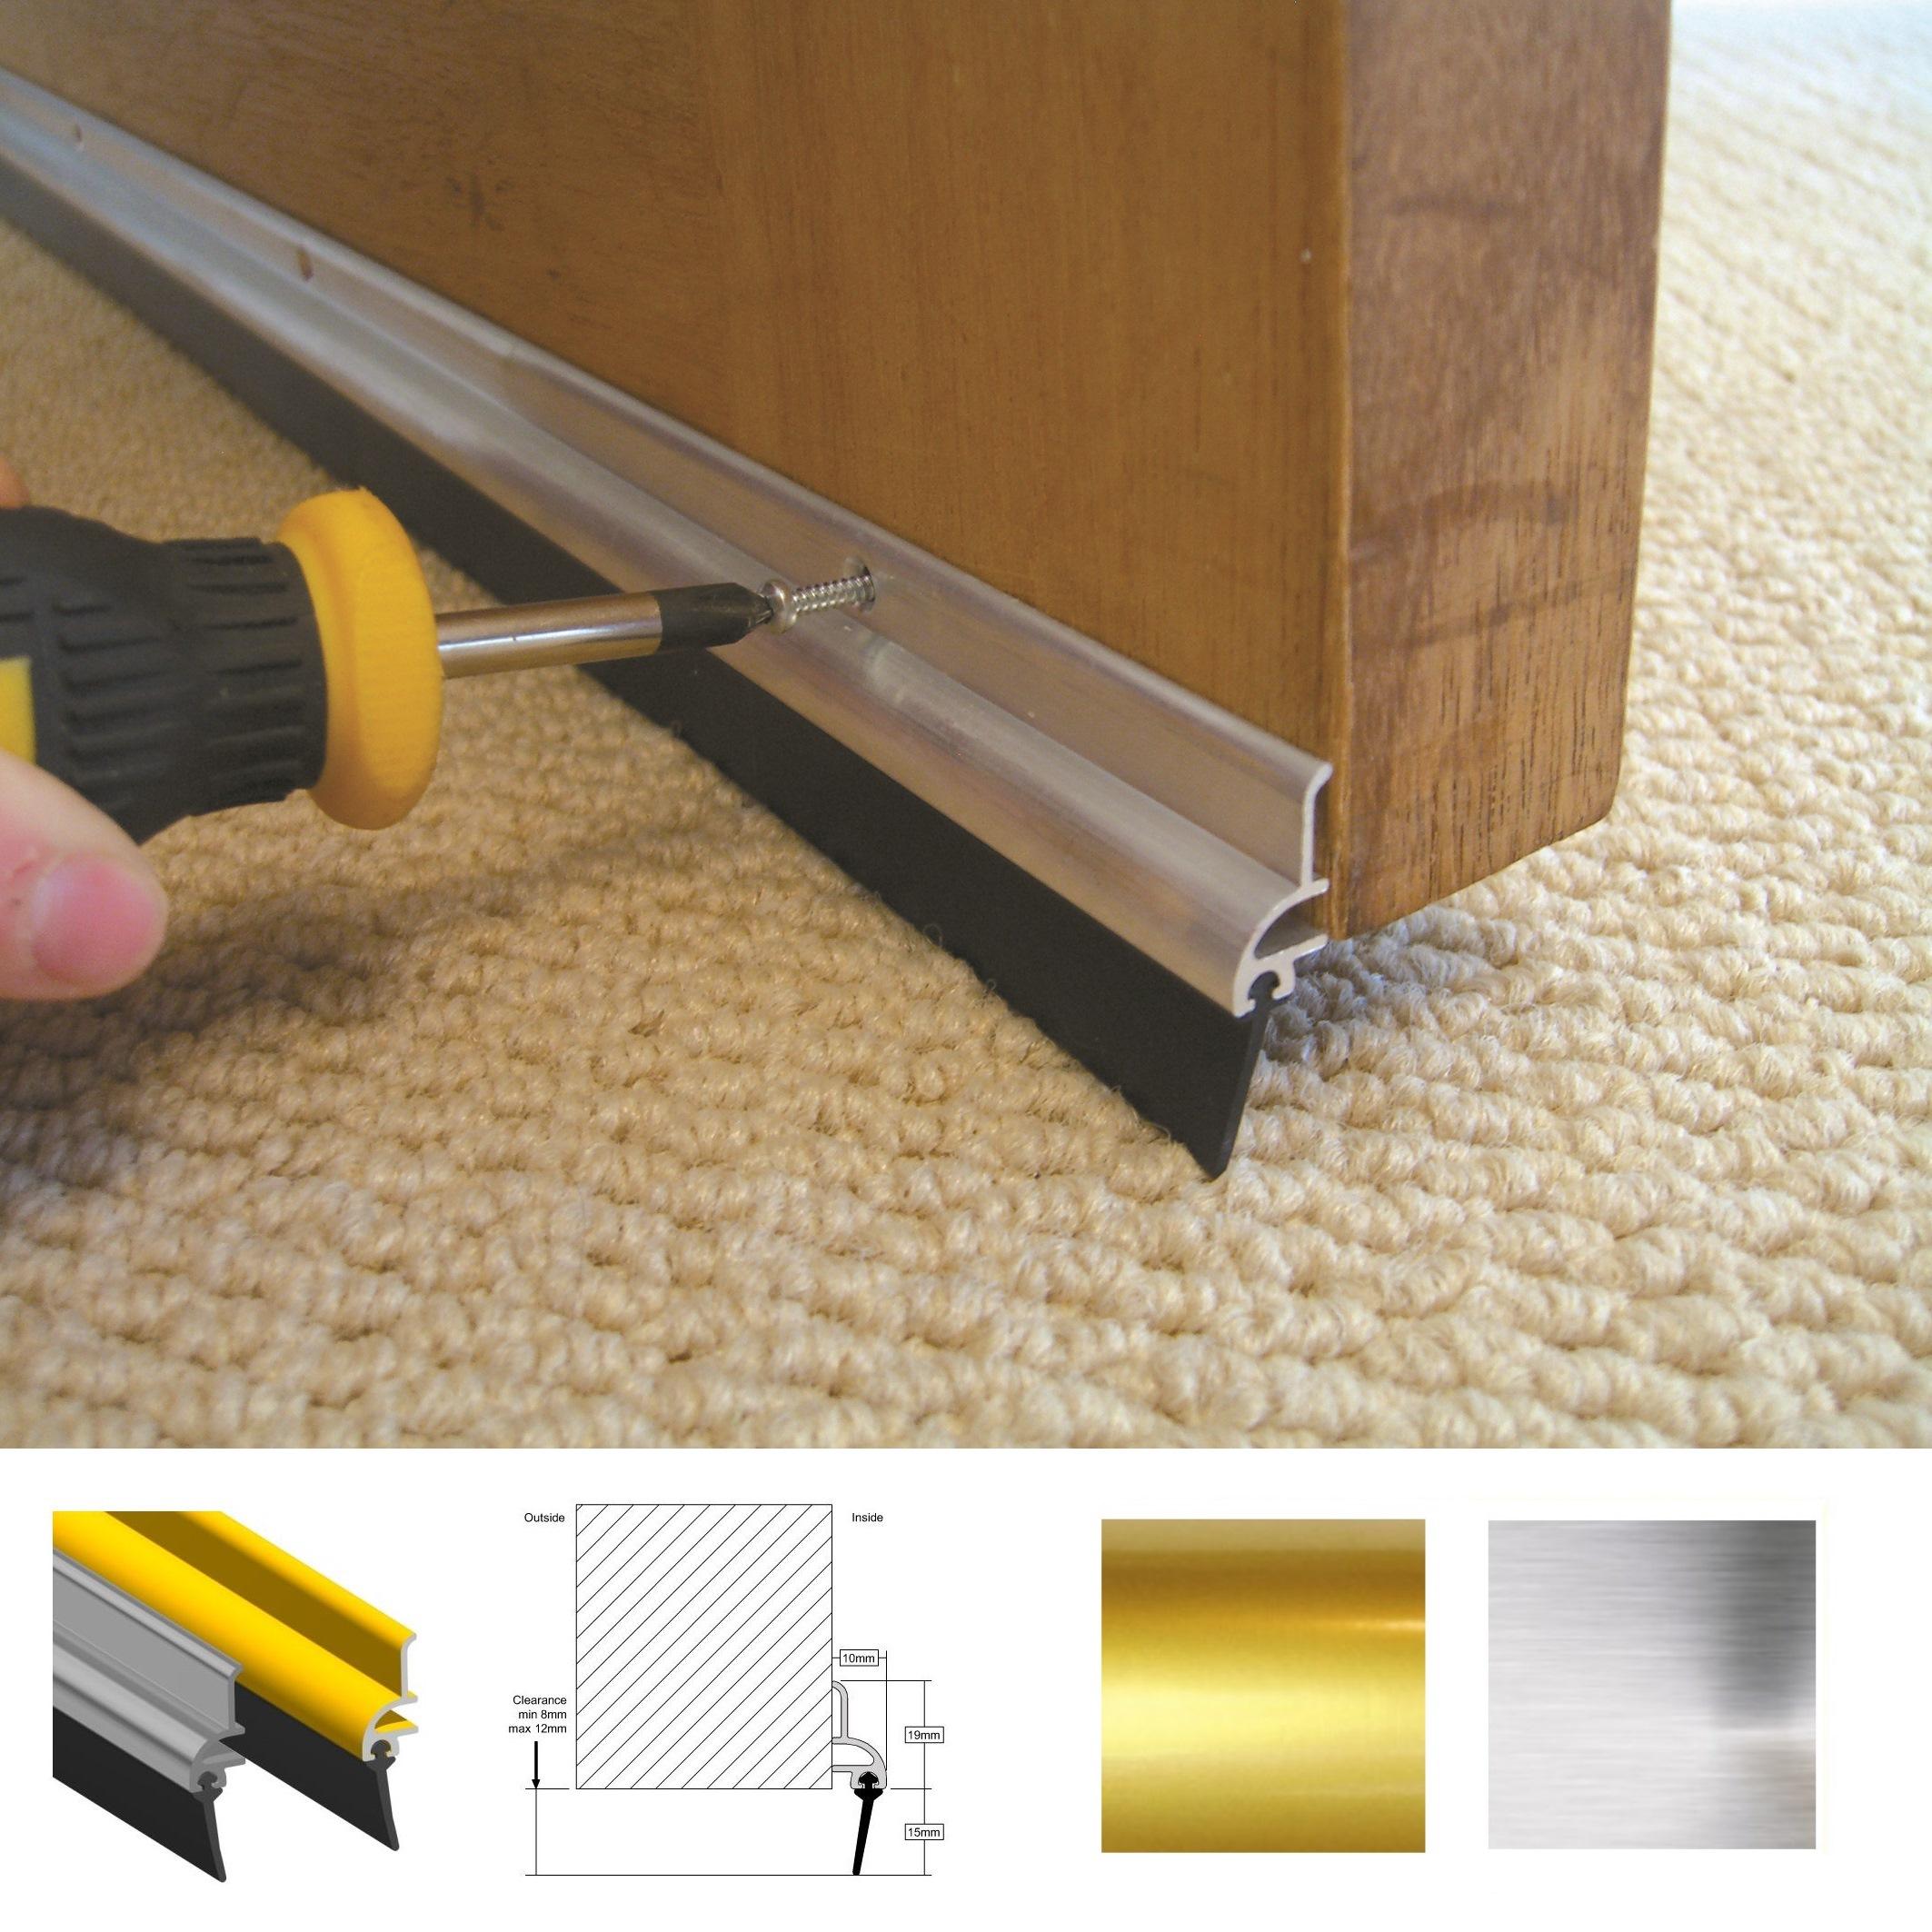 Rubber-Door-Draught-Excluder-Stormguard-Rubber-Draft-Excluder-914mm-36